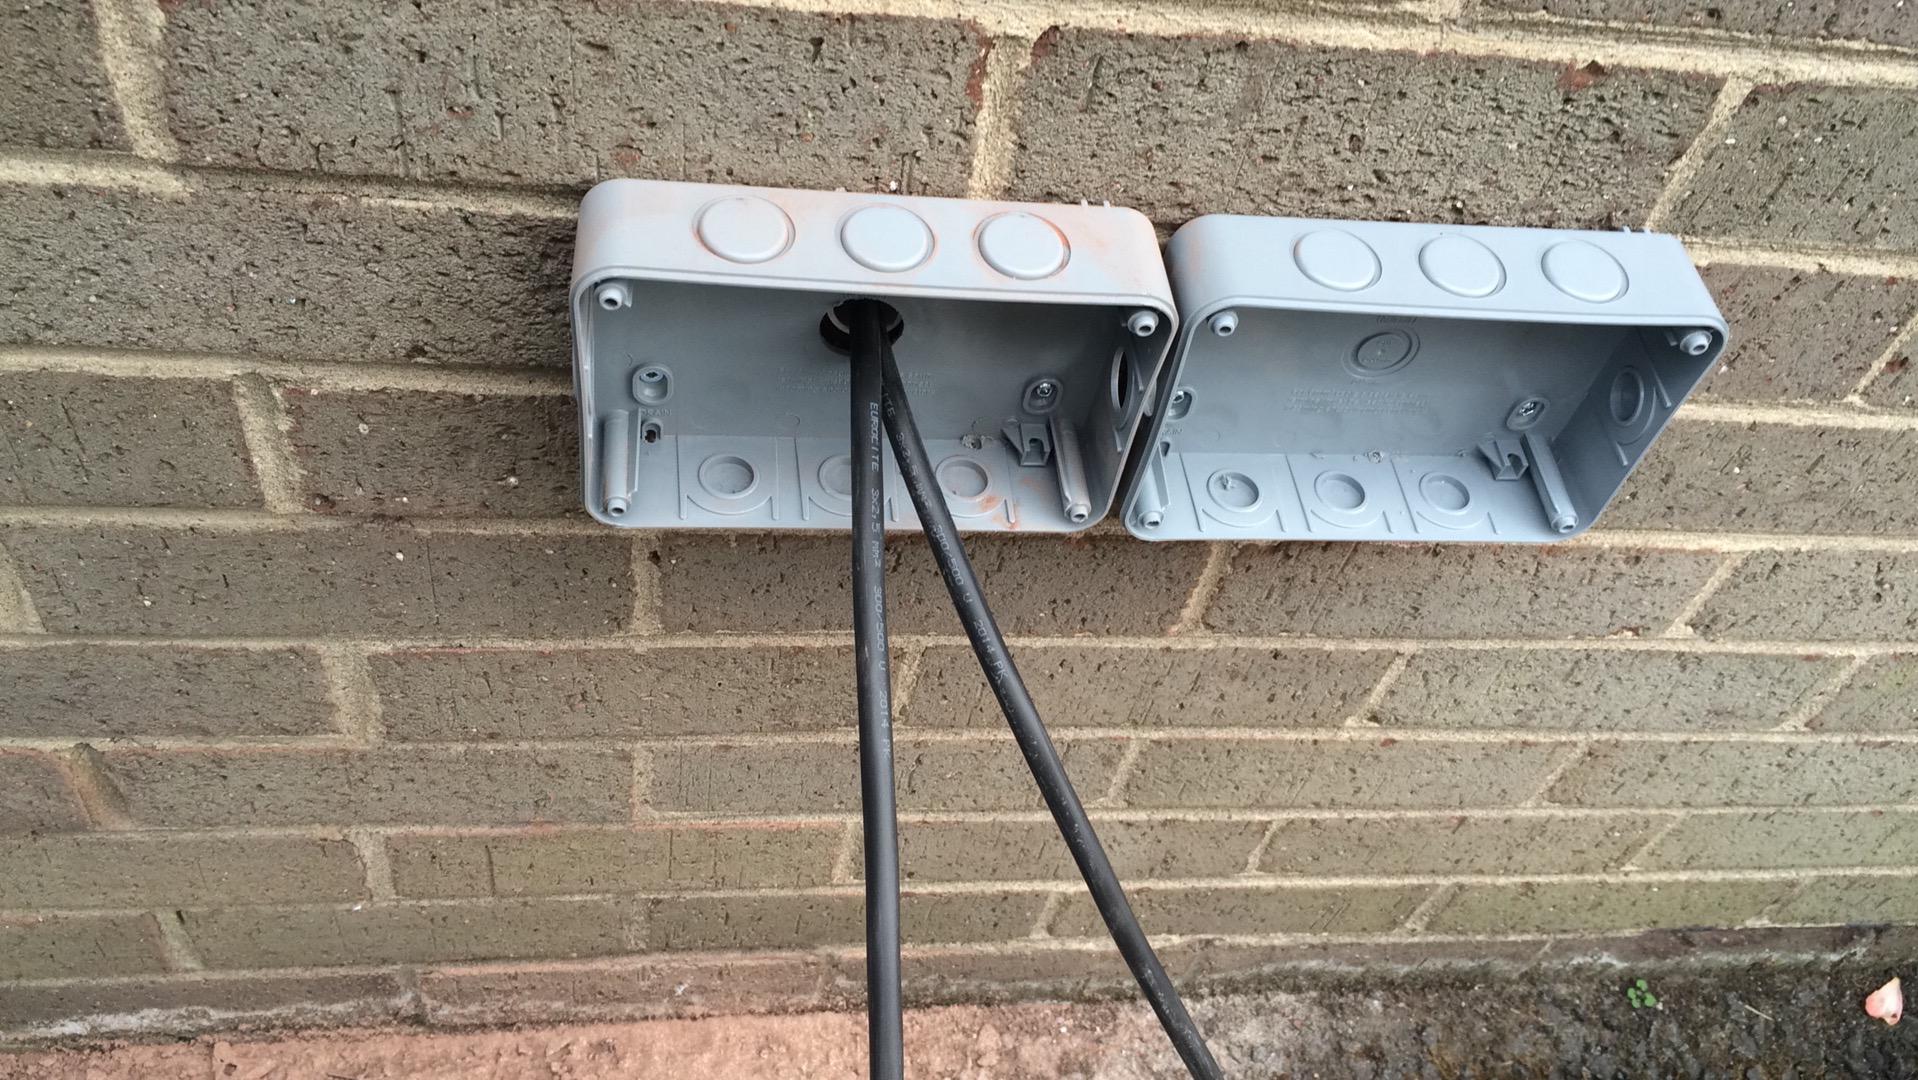 Installing the new IP66 waterproof plugs